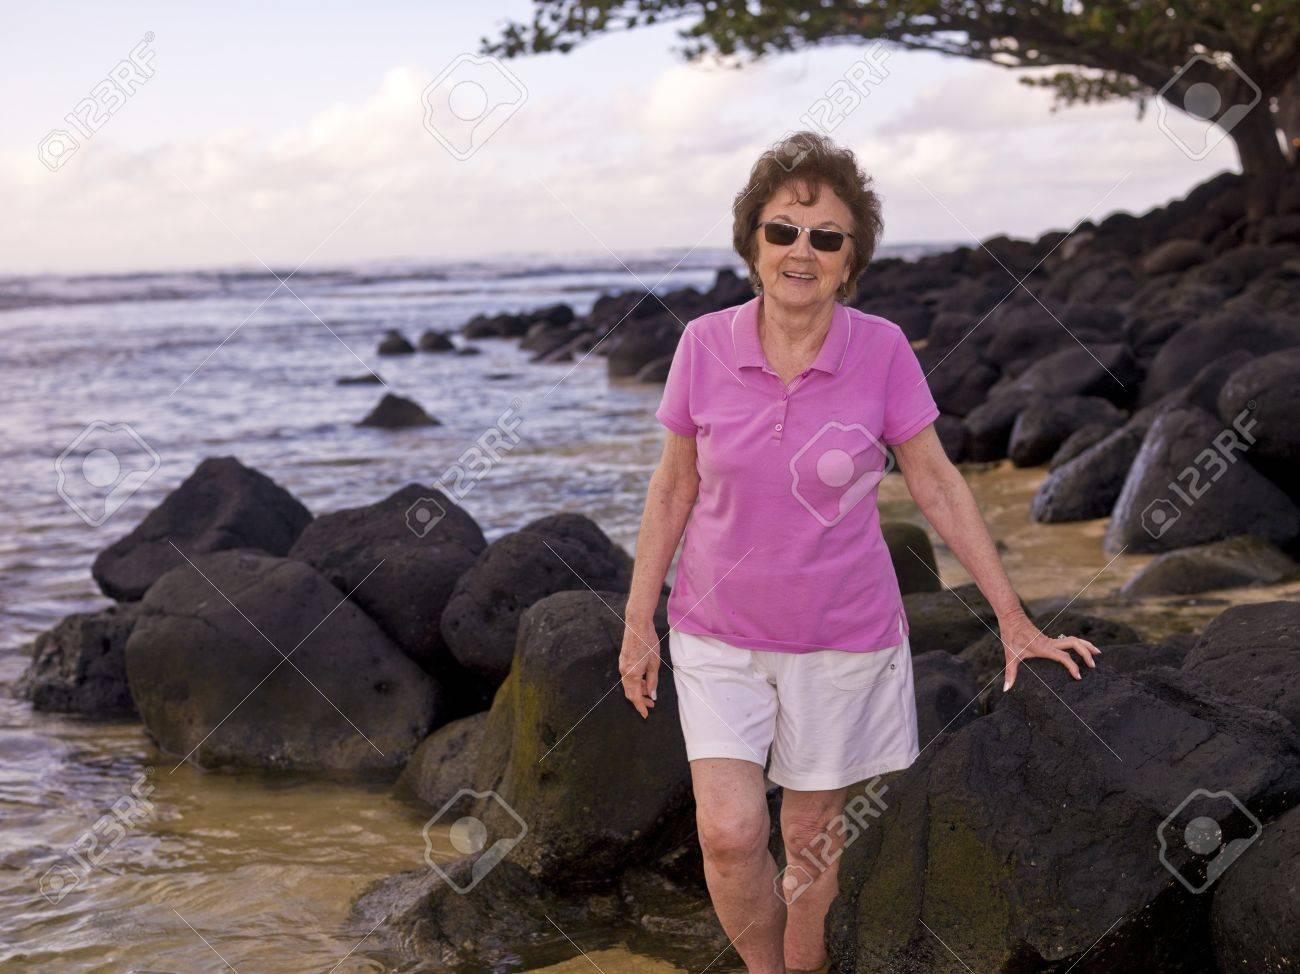 Woman on a rocky beach, Kauai, Hawaii, USA Stock Photo - 7208221